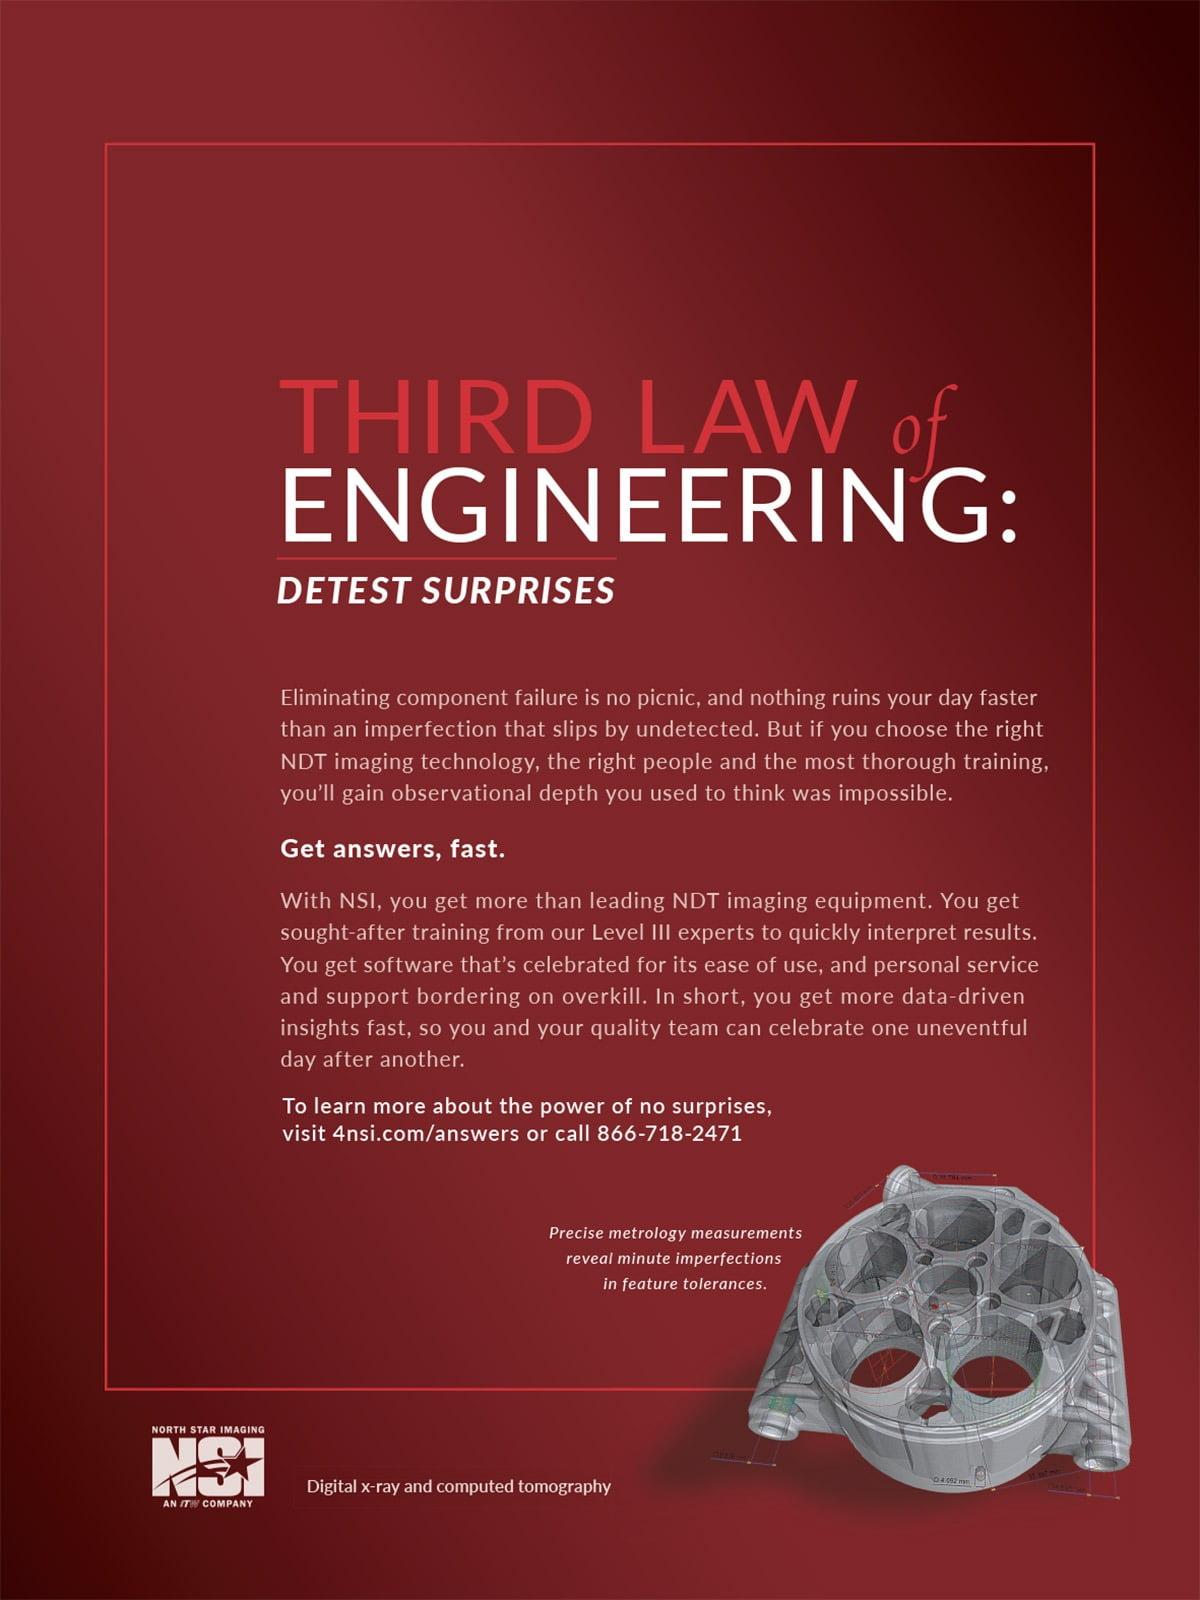 Human, Organism, Product, Lighting, Vertebrate, Event, Text, Mammal, Red, Photograph